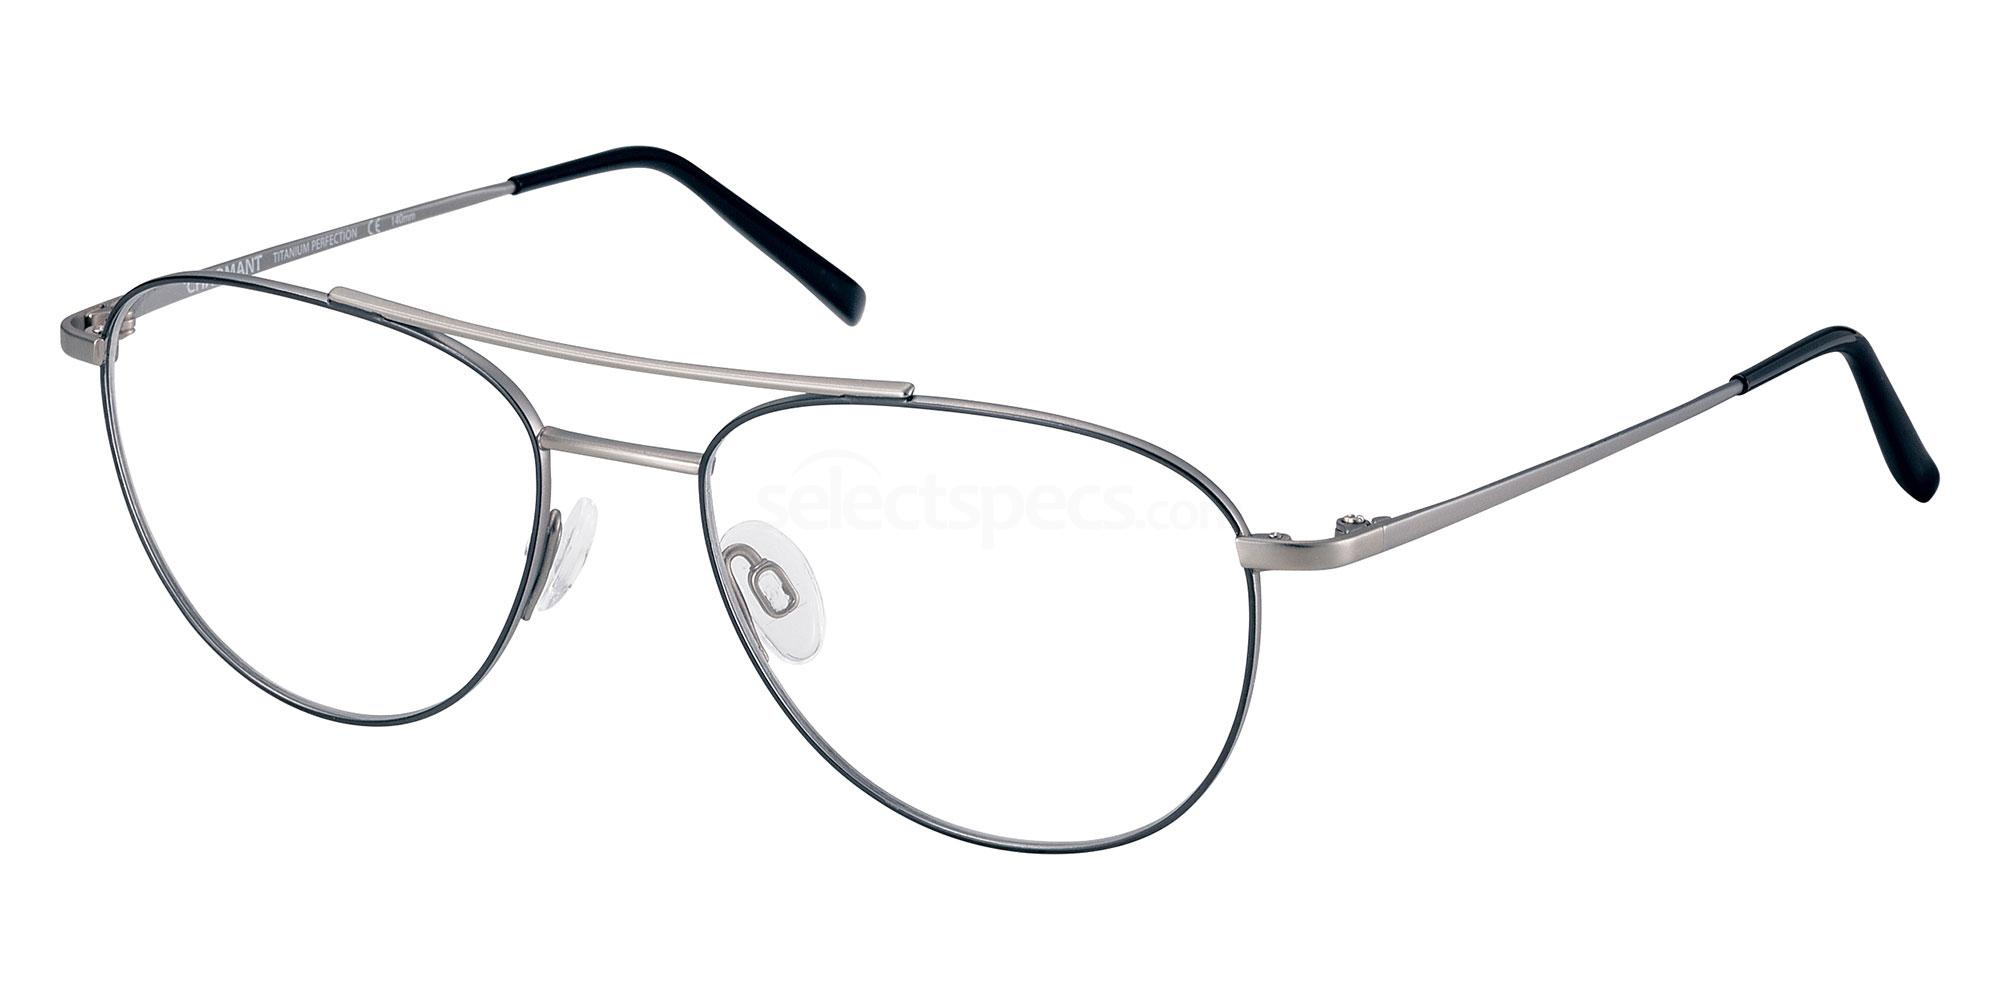 BK CH11467U Glasses, Charmant Titanium Perfection